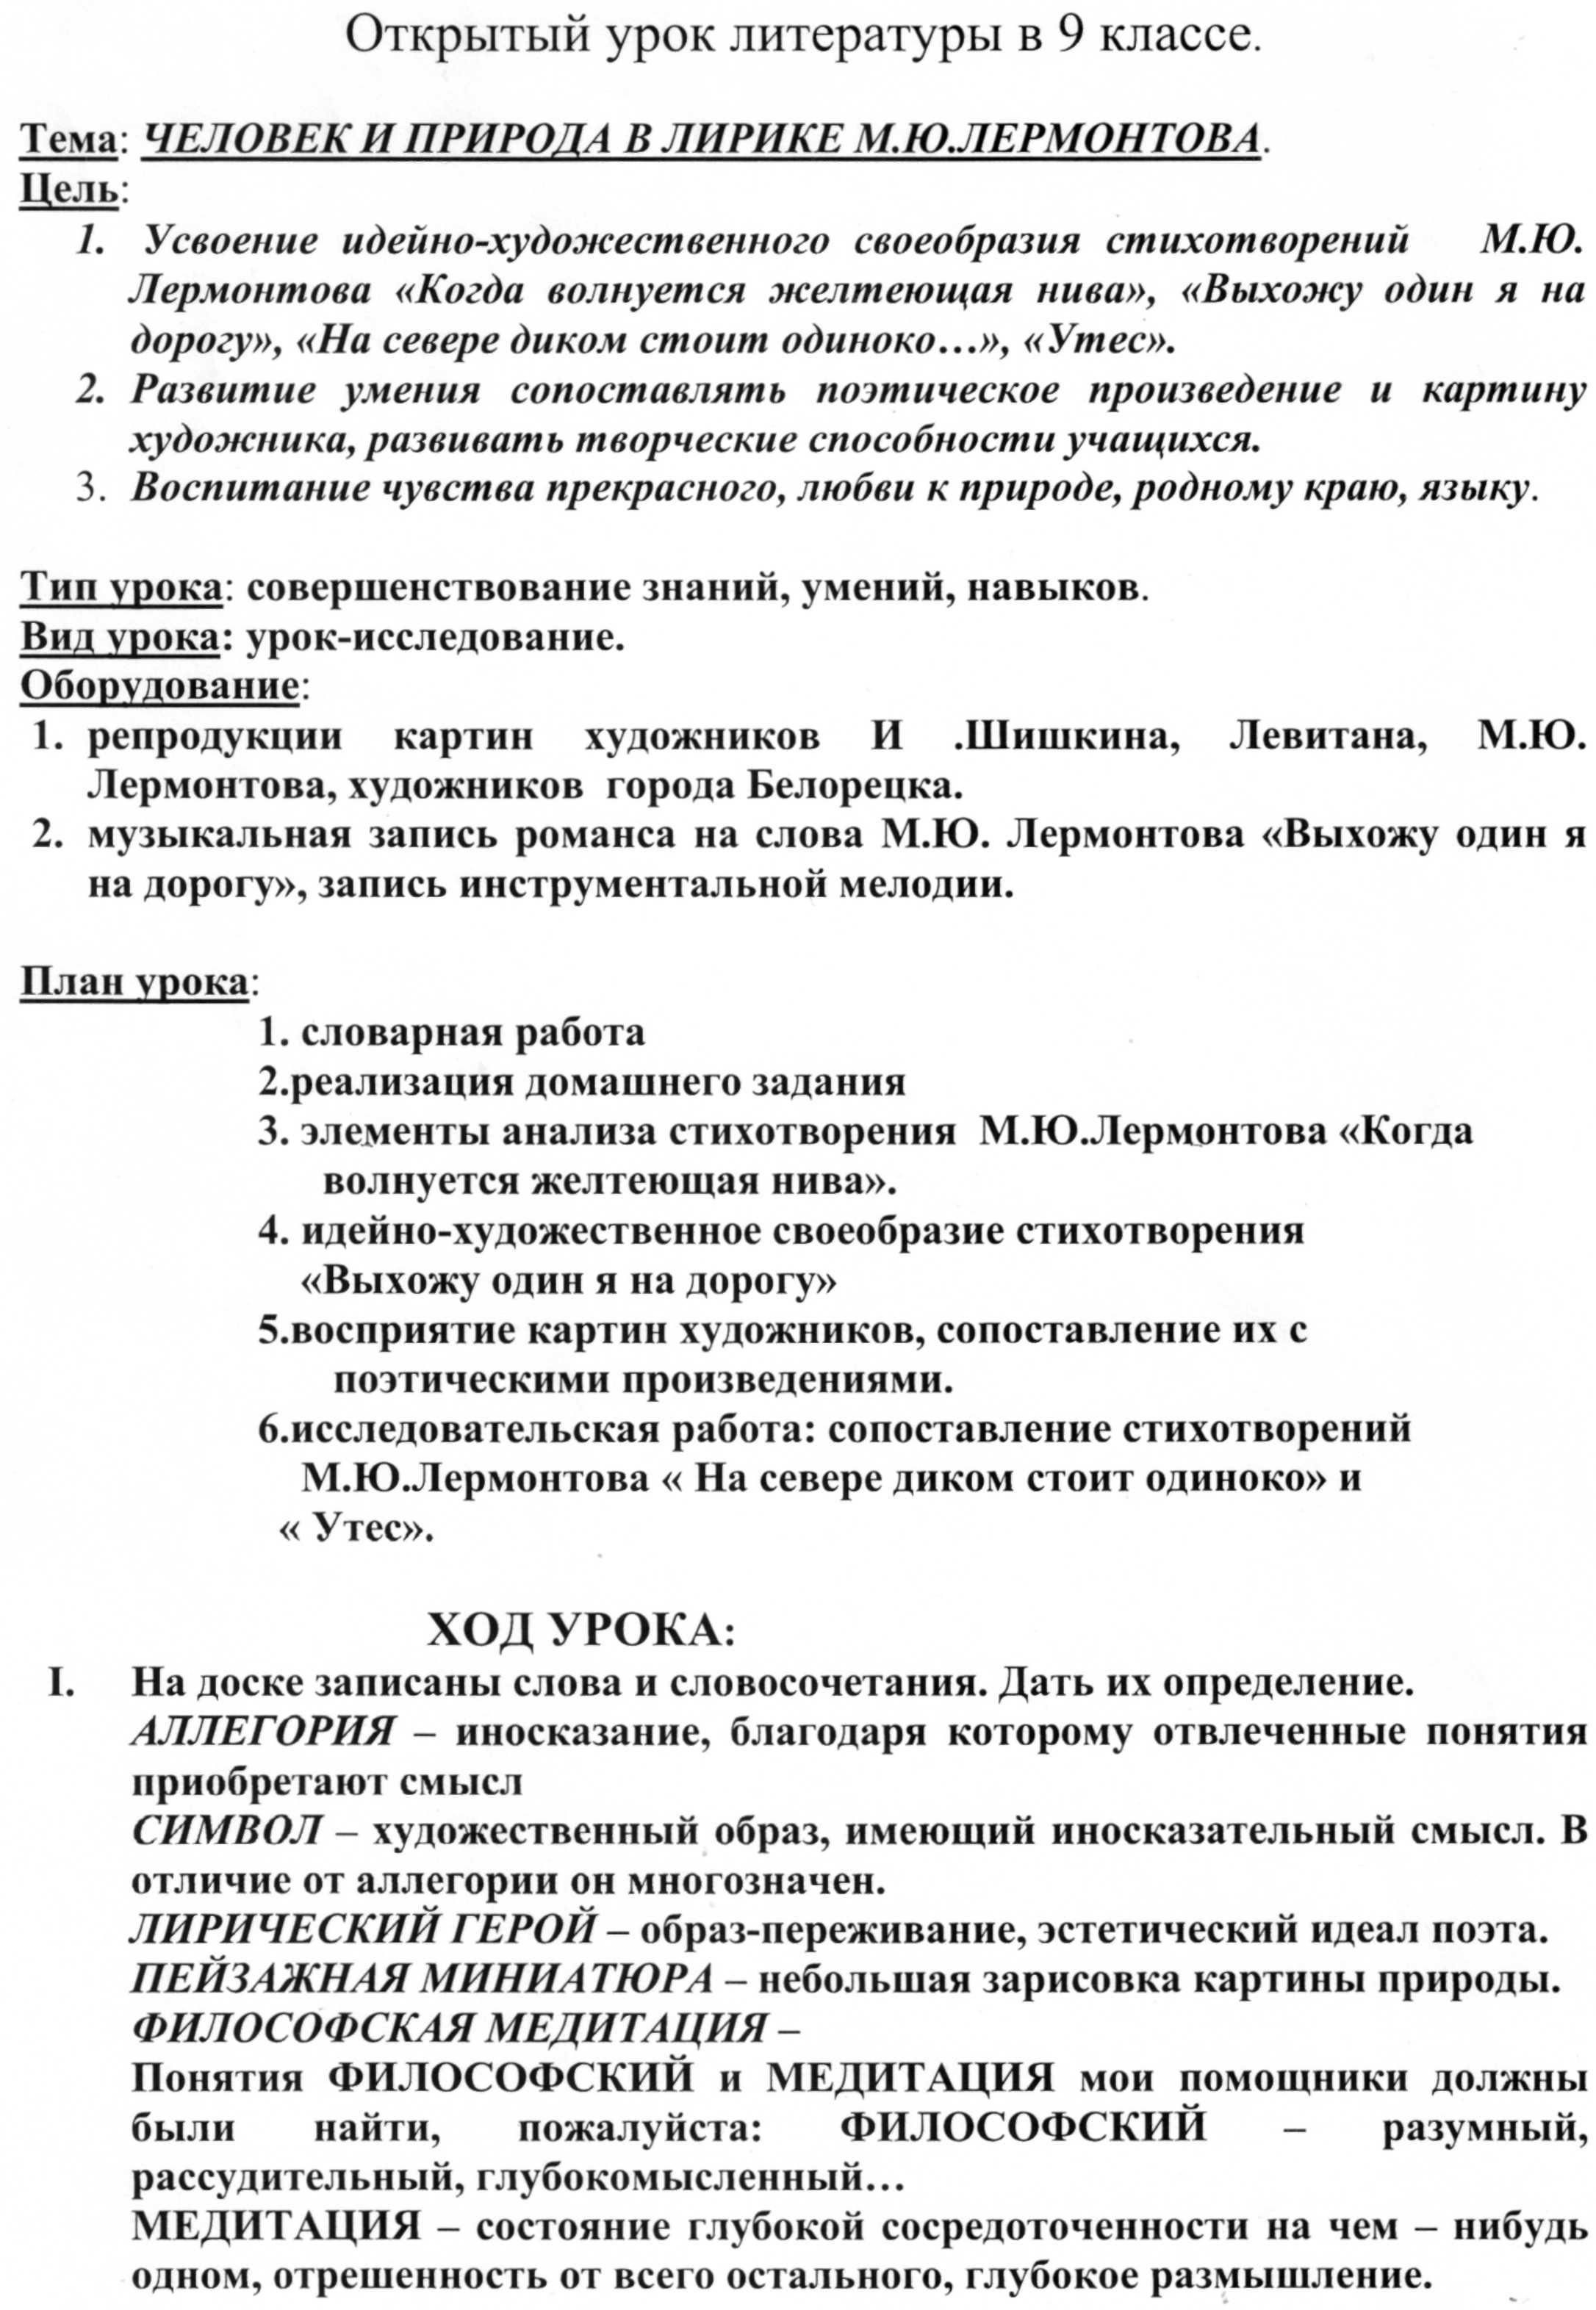 hello_html_173c2f96.jpg